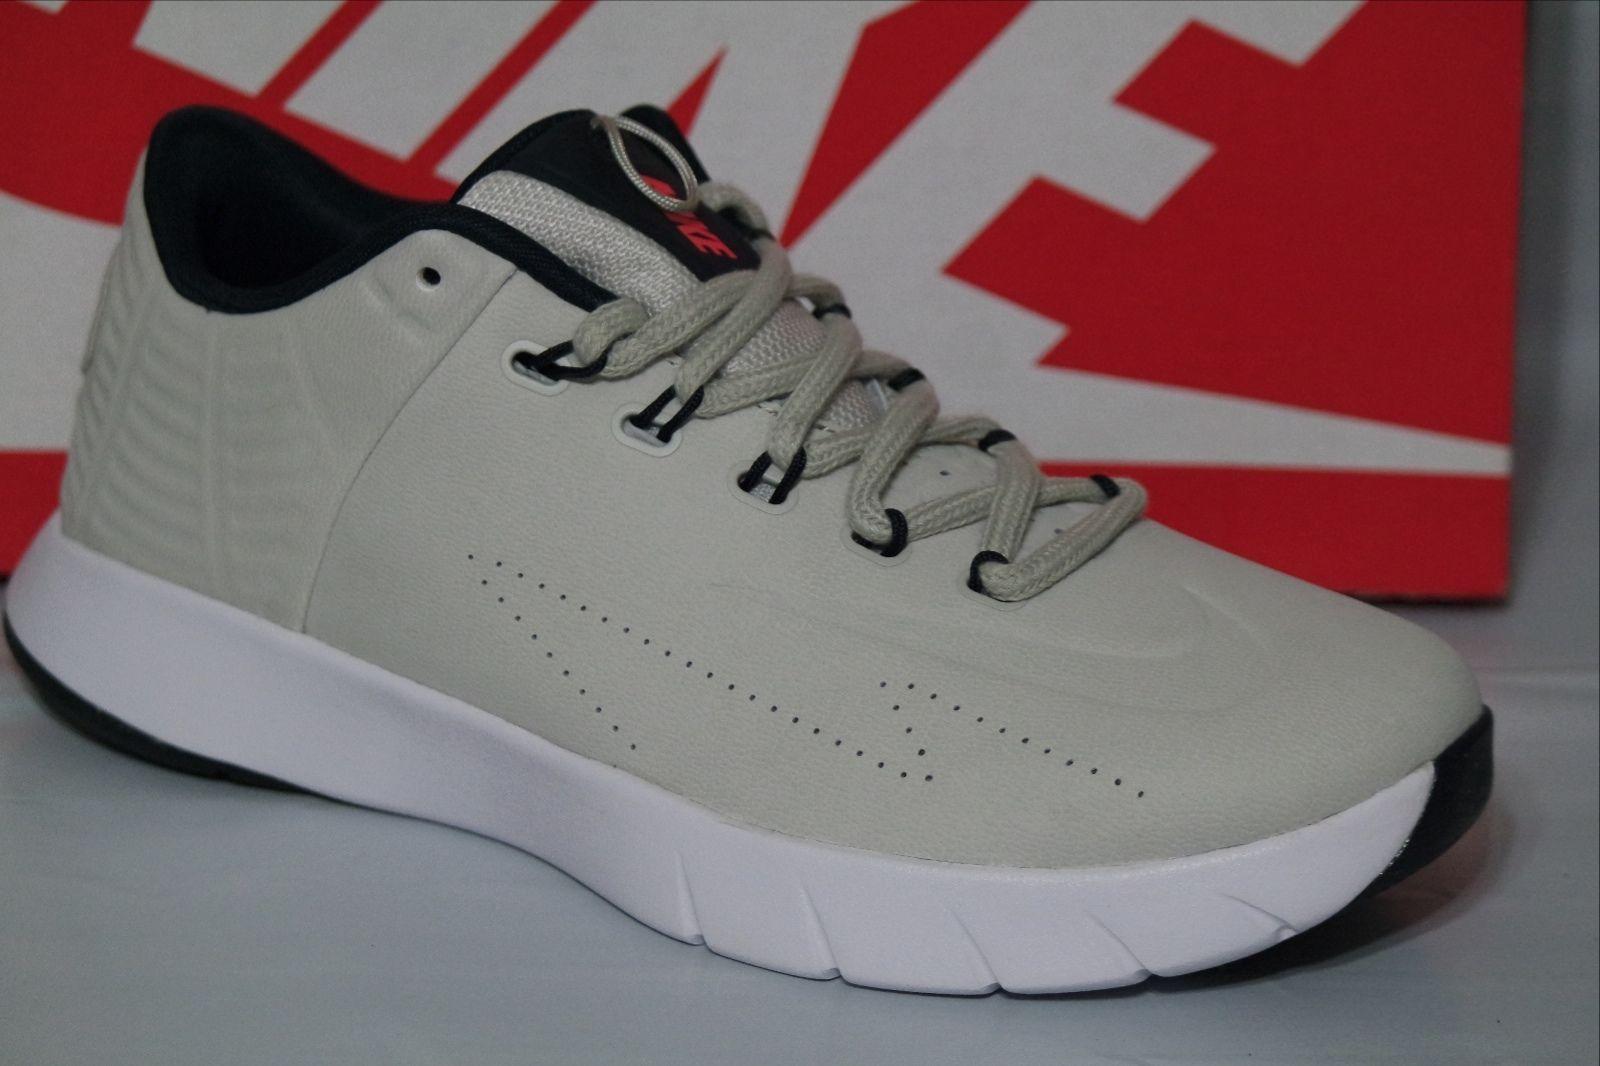 NIB MEN'S NIKE MD Runner 2 Mid Premium Sneakers Shoes Black